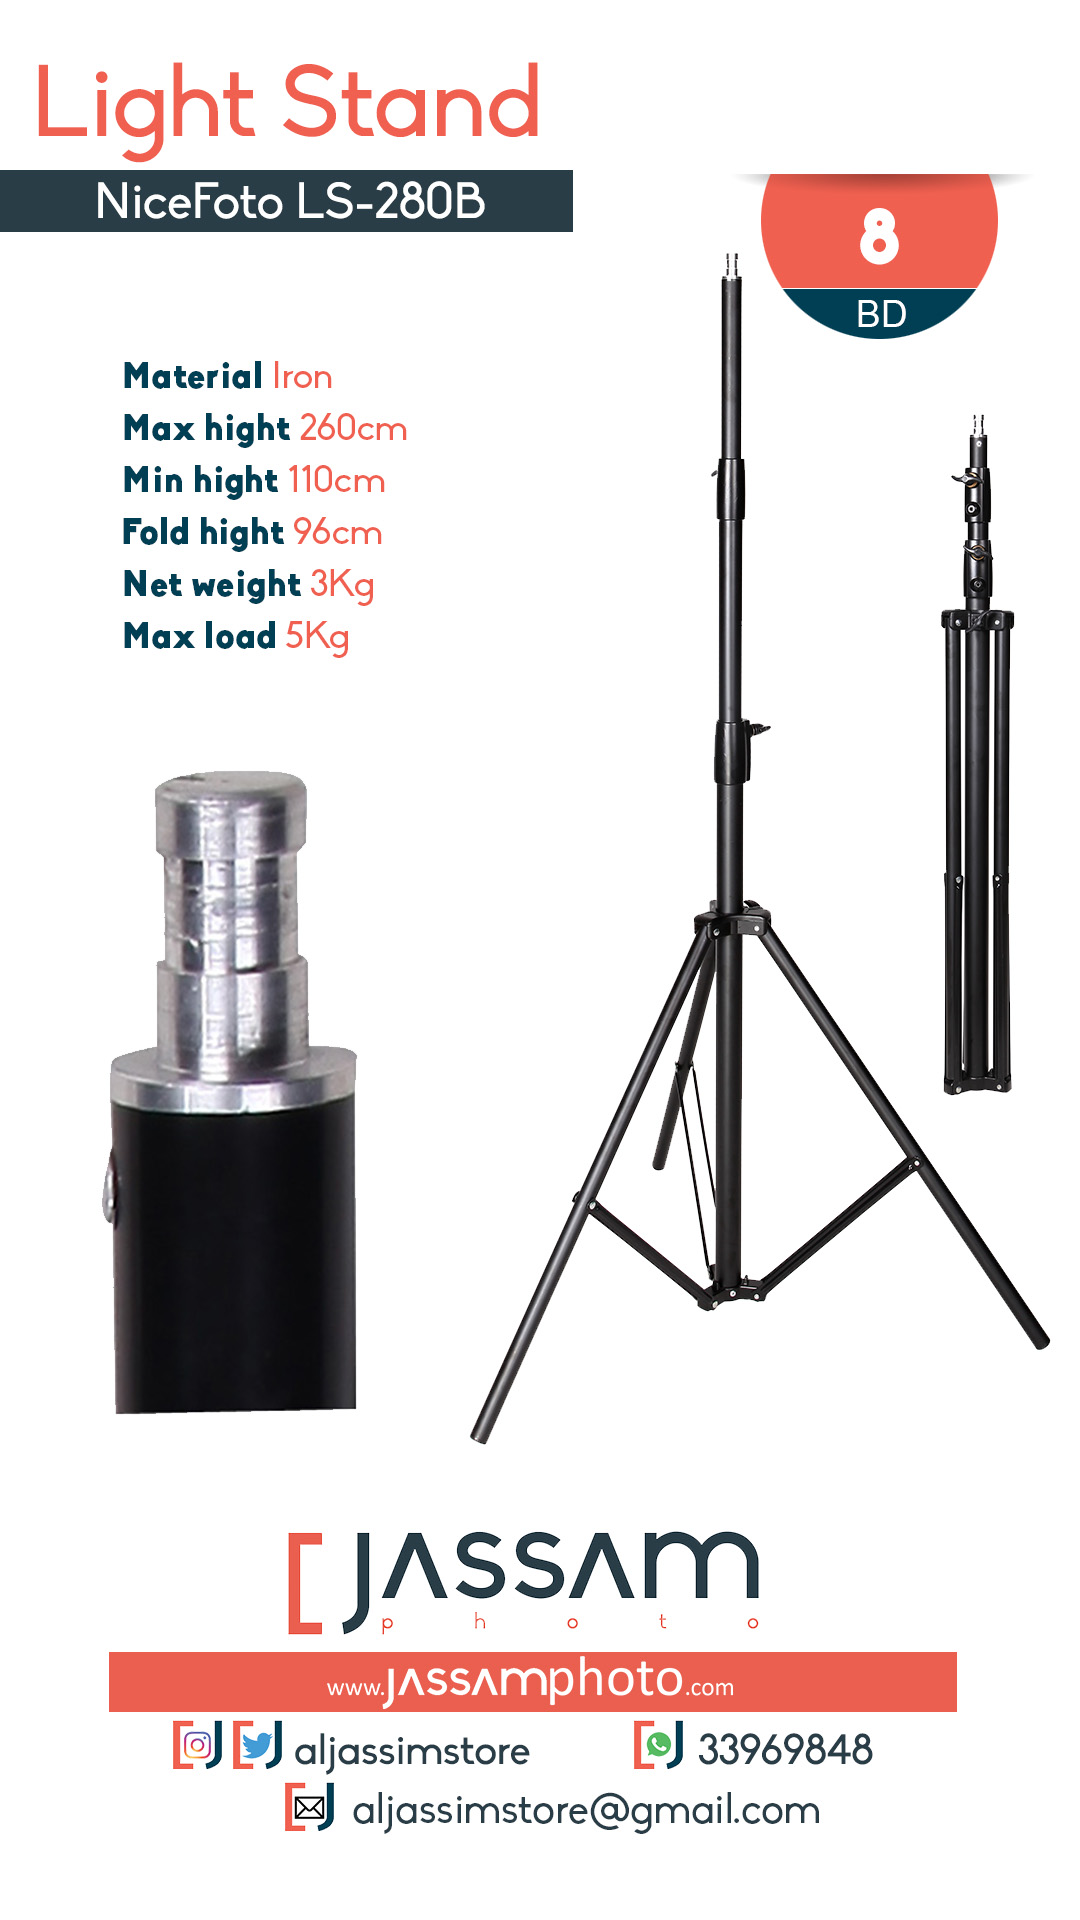 Light Stand LS-280B